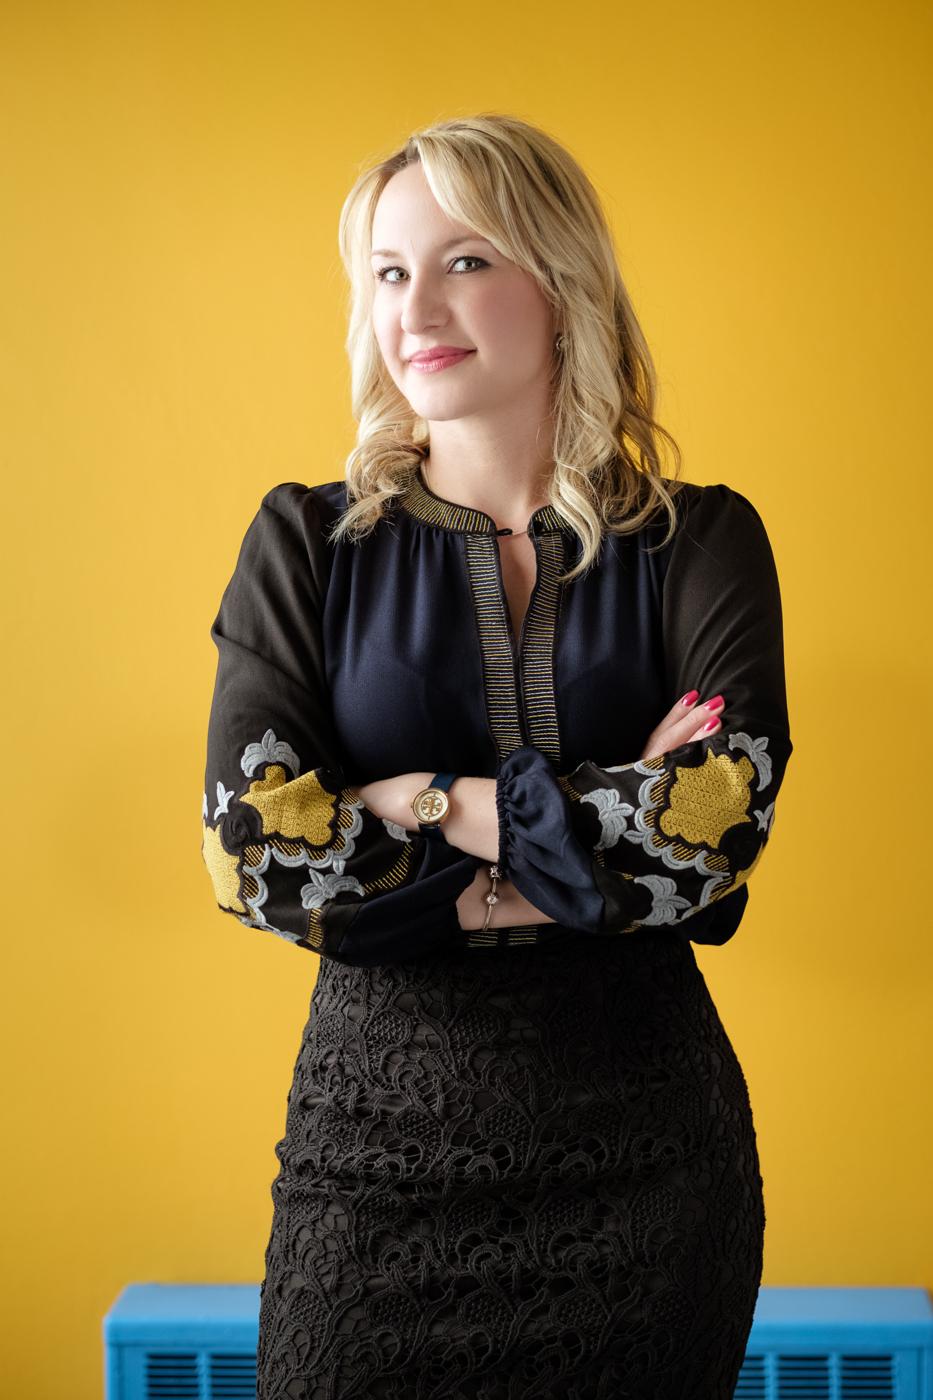 Anna Sergunina